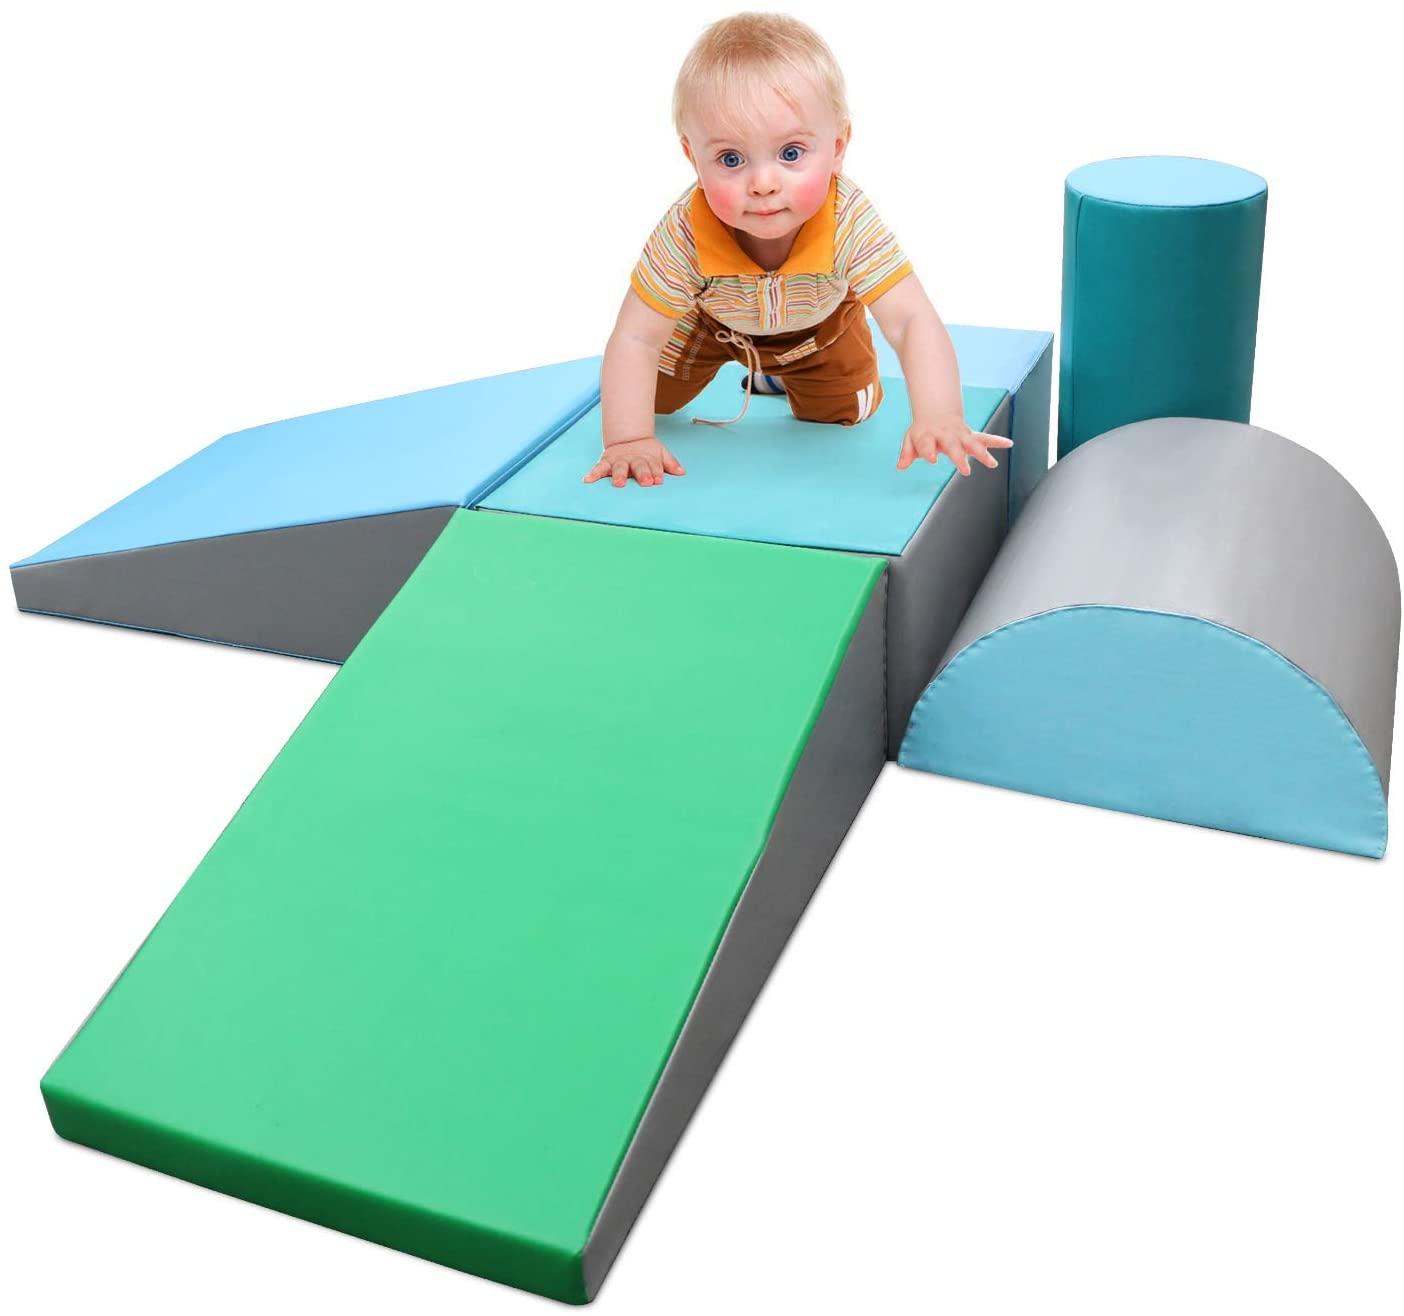 Foam jungle gym blocks